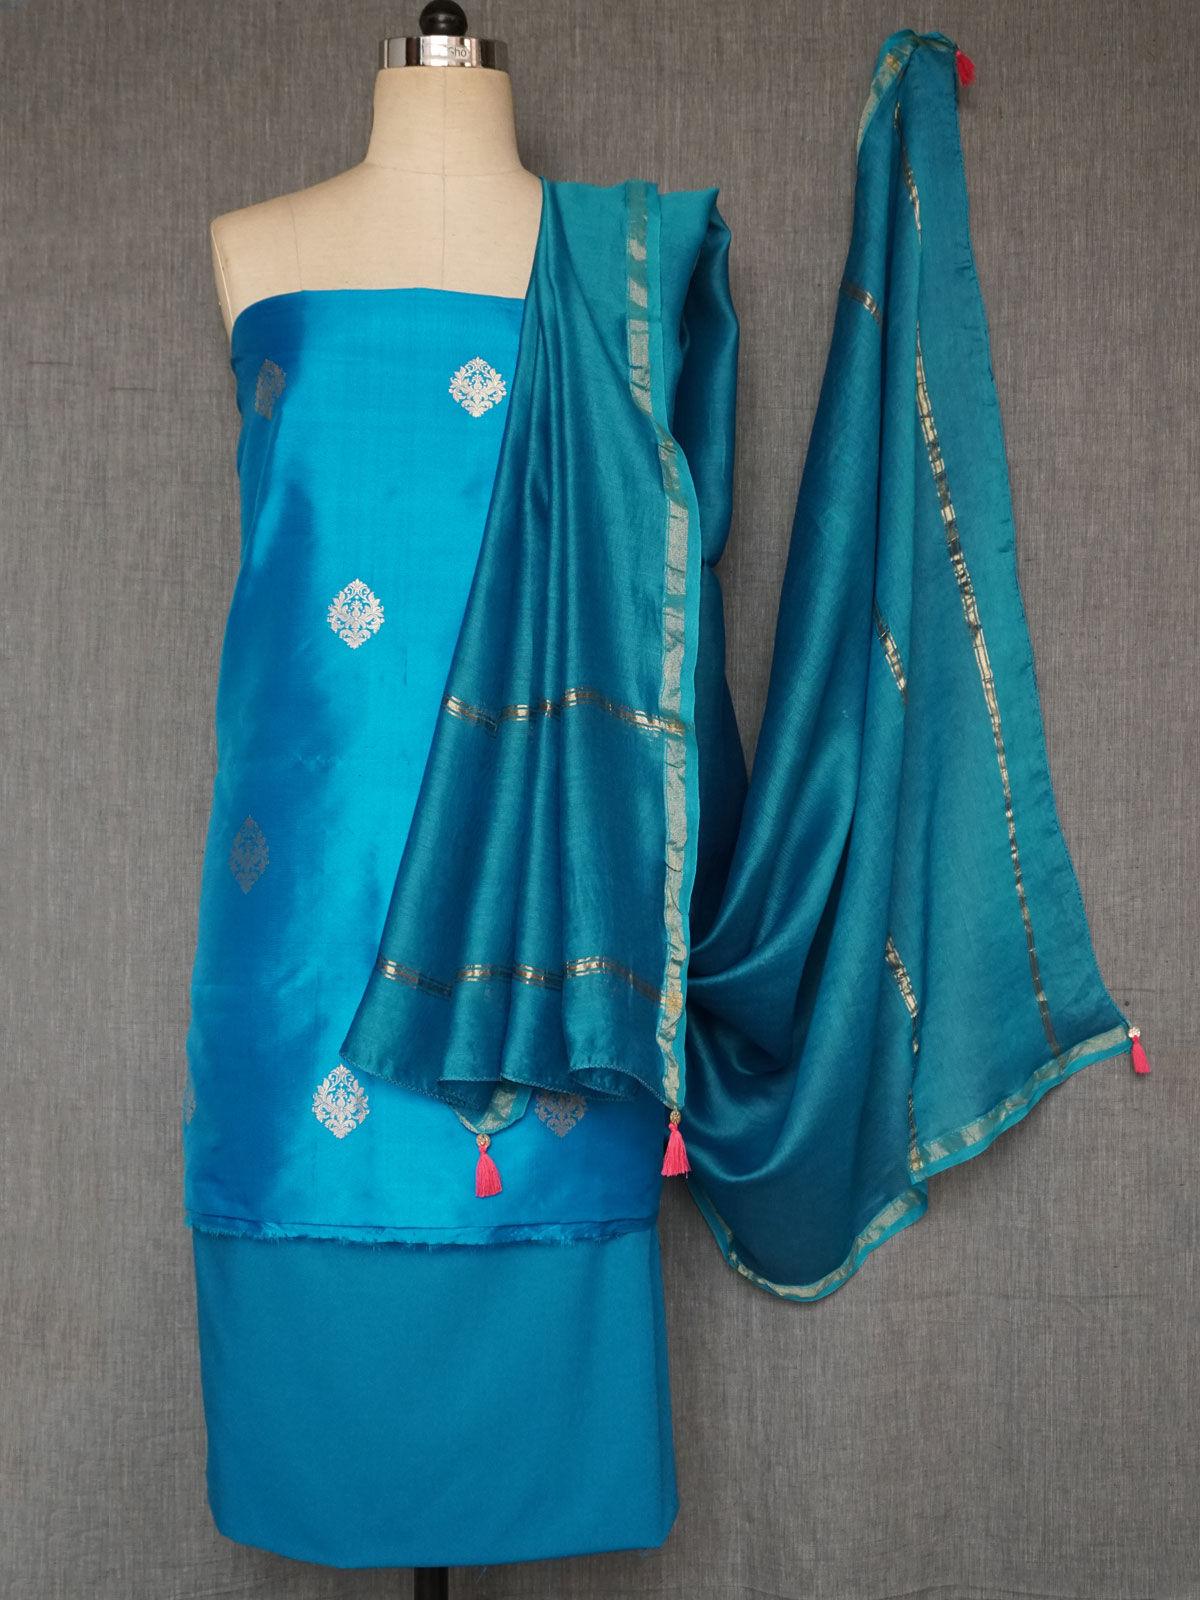 Teal woven zari booti silk dress material with chanderi dupatta